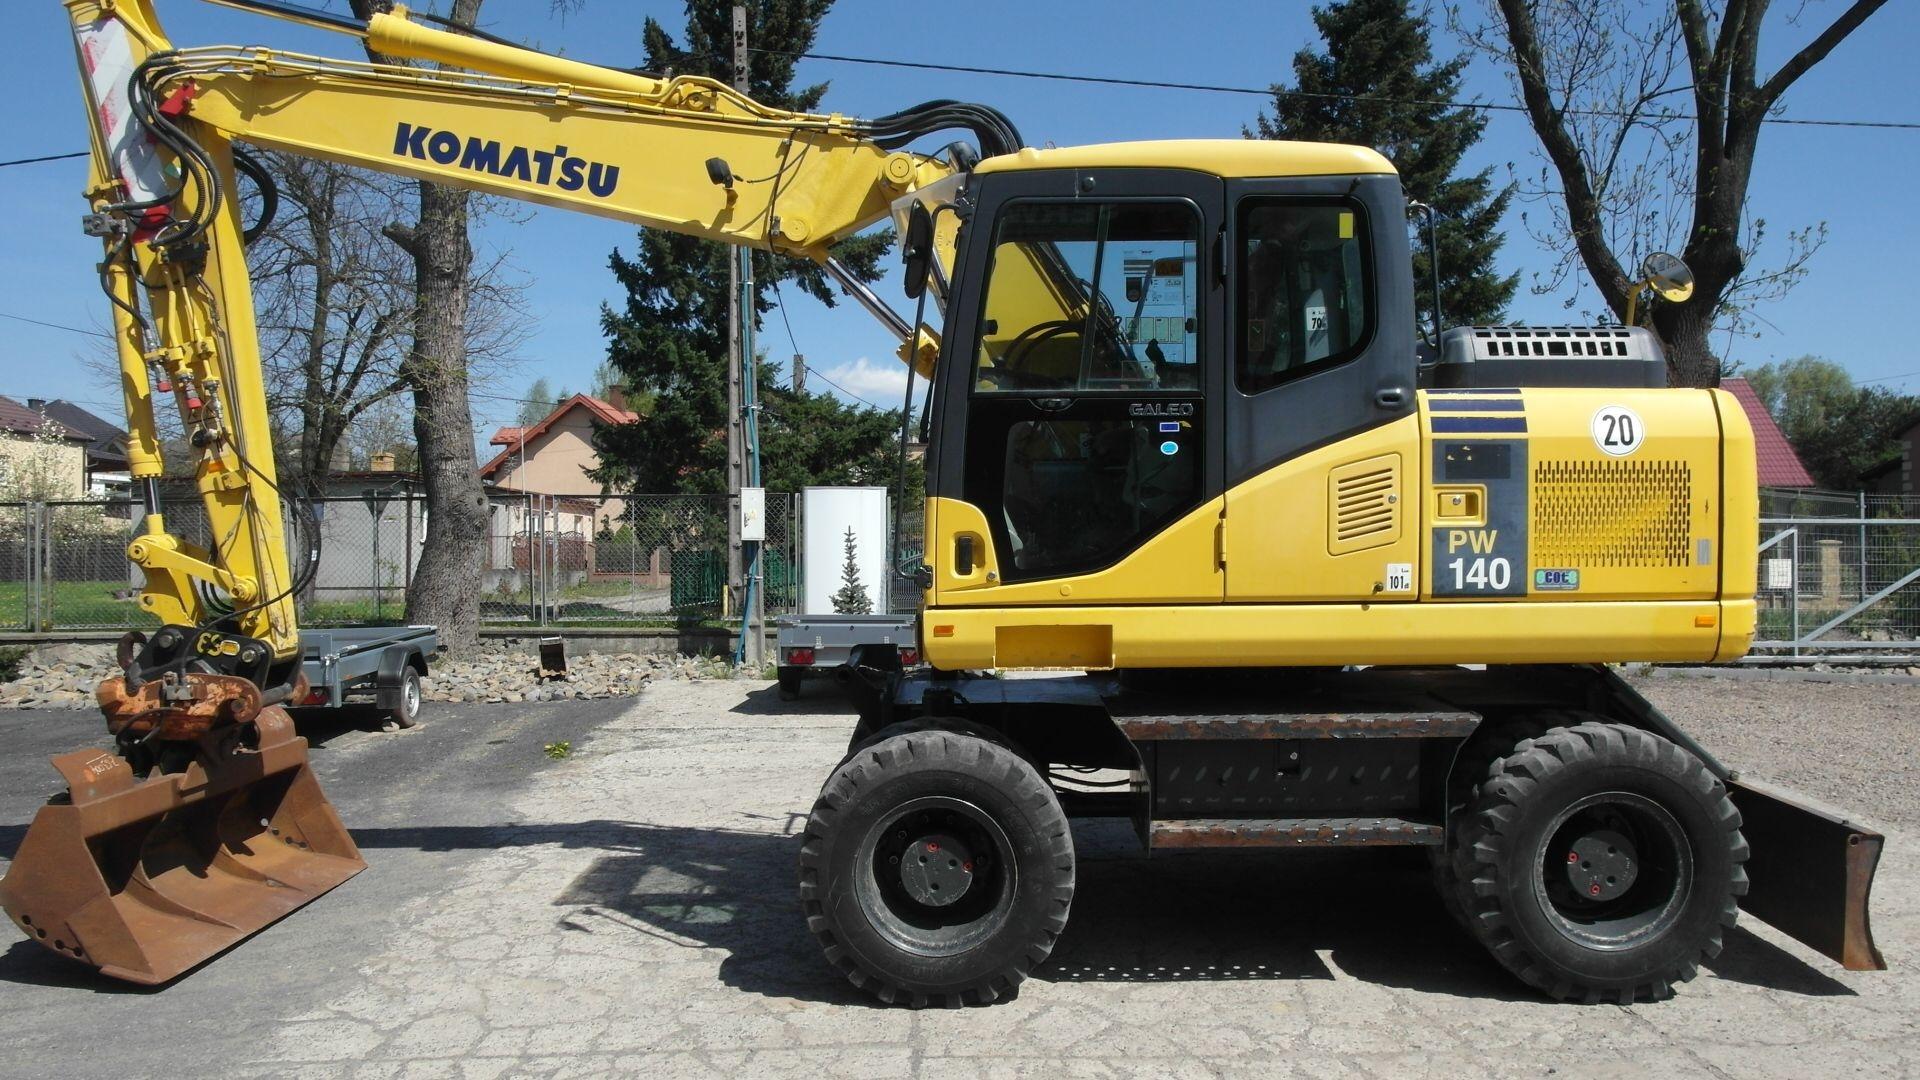 Komatsu PW 140 2007